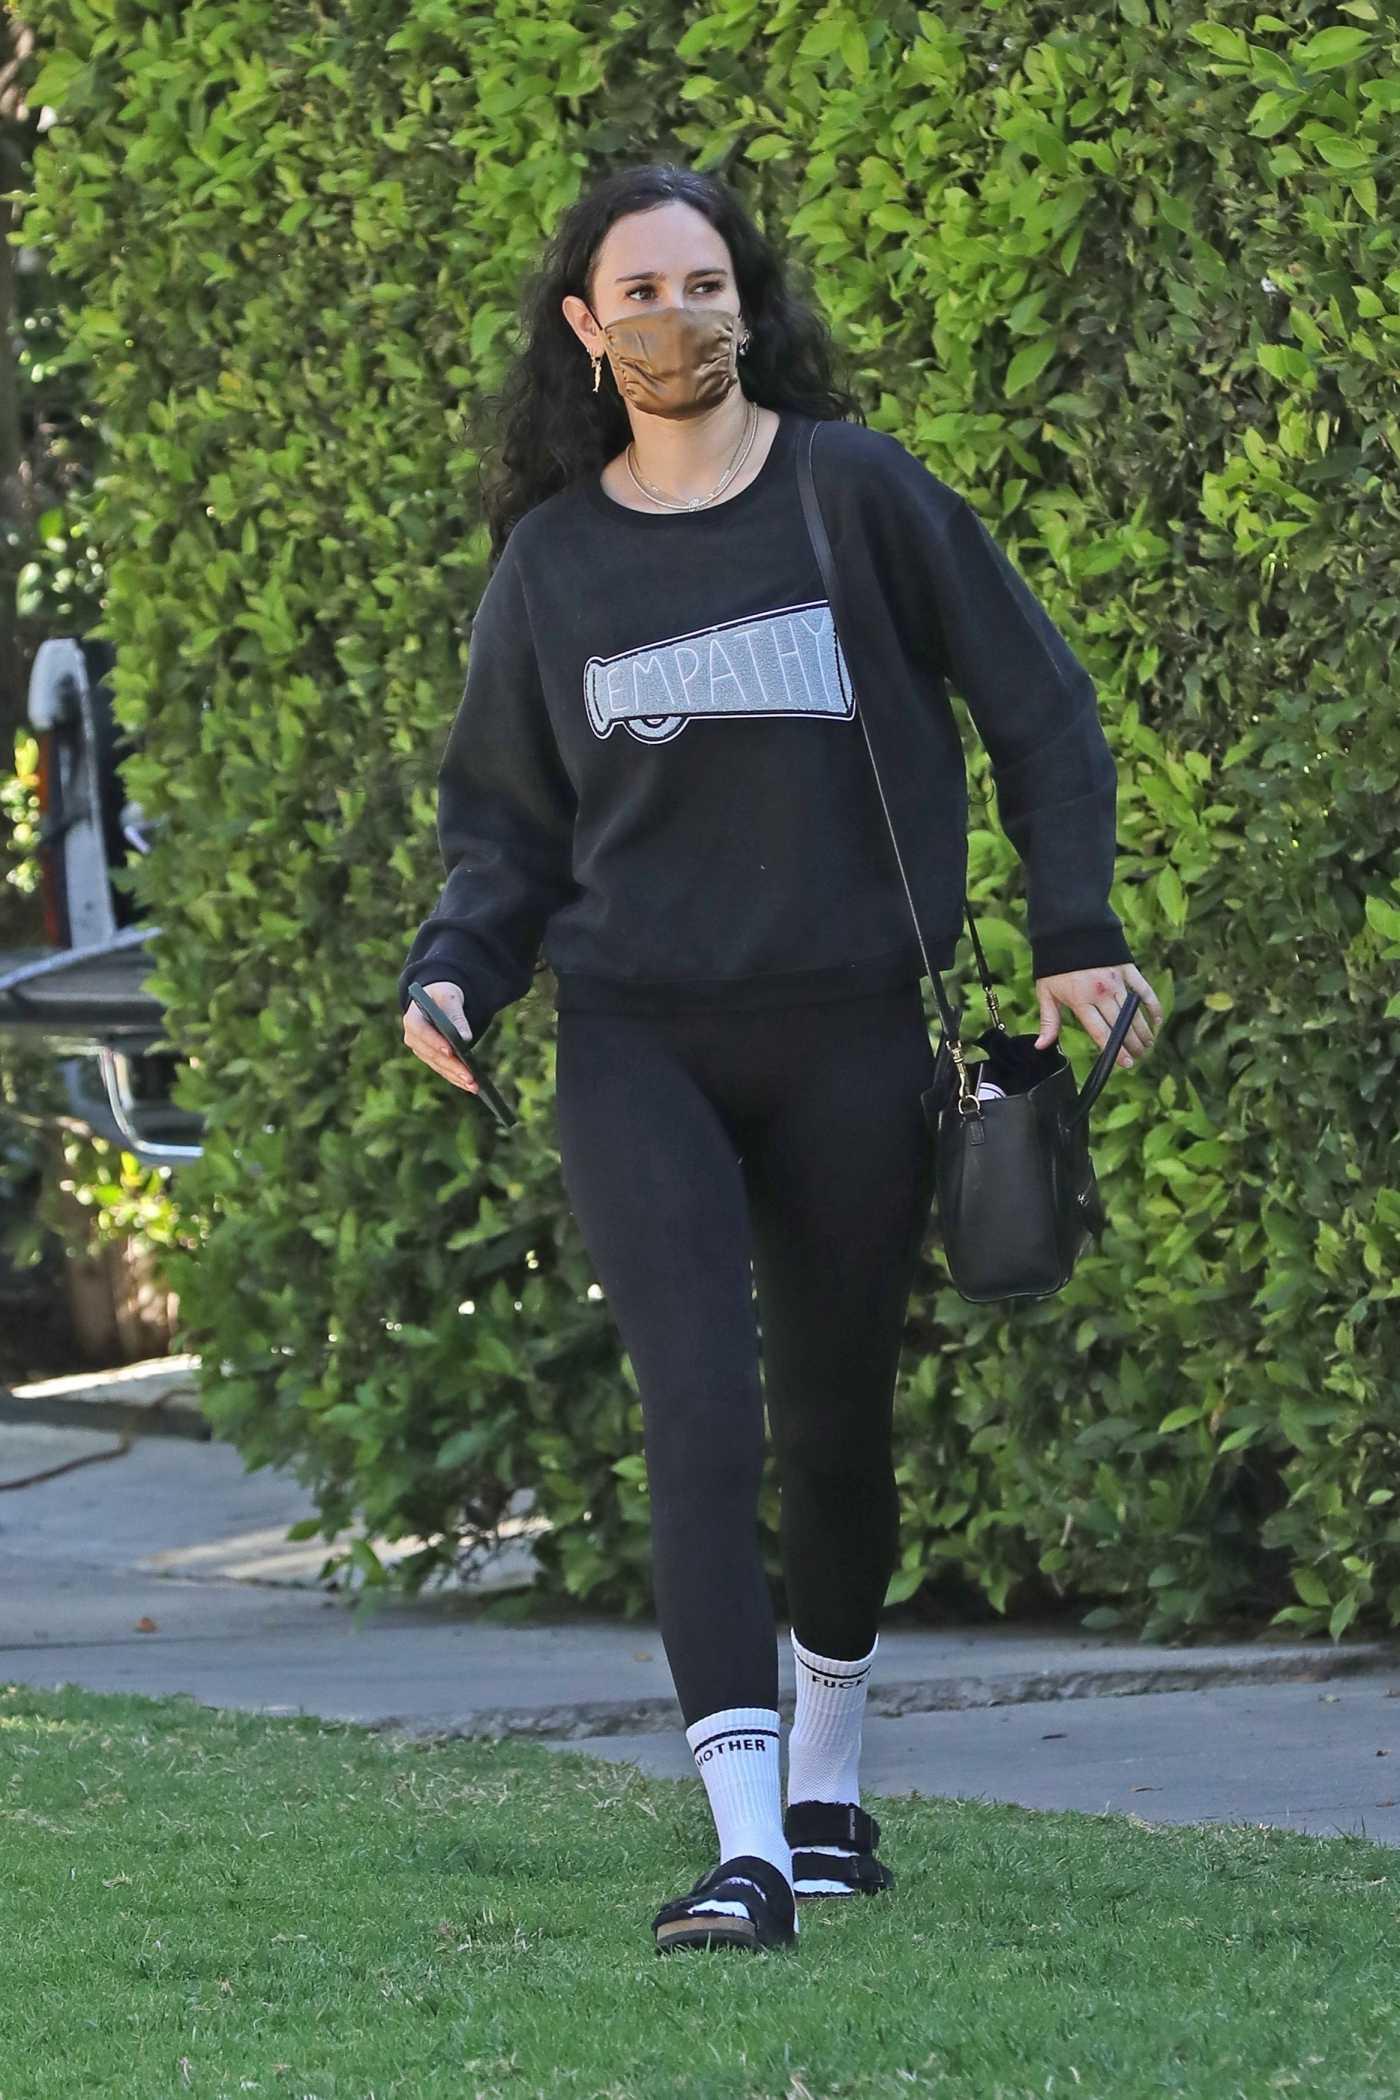 Rumer Willis in a Black Sweatshirt Leaves a Private Gym in Los Angeles 03/29/2021